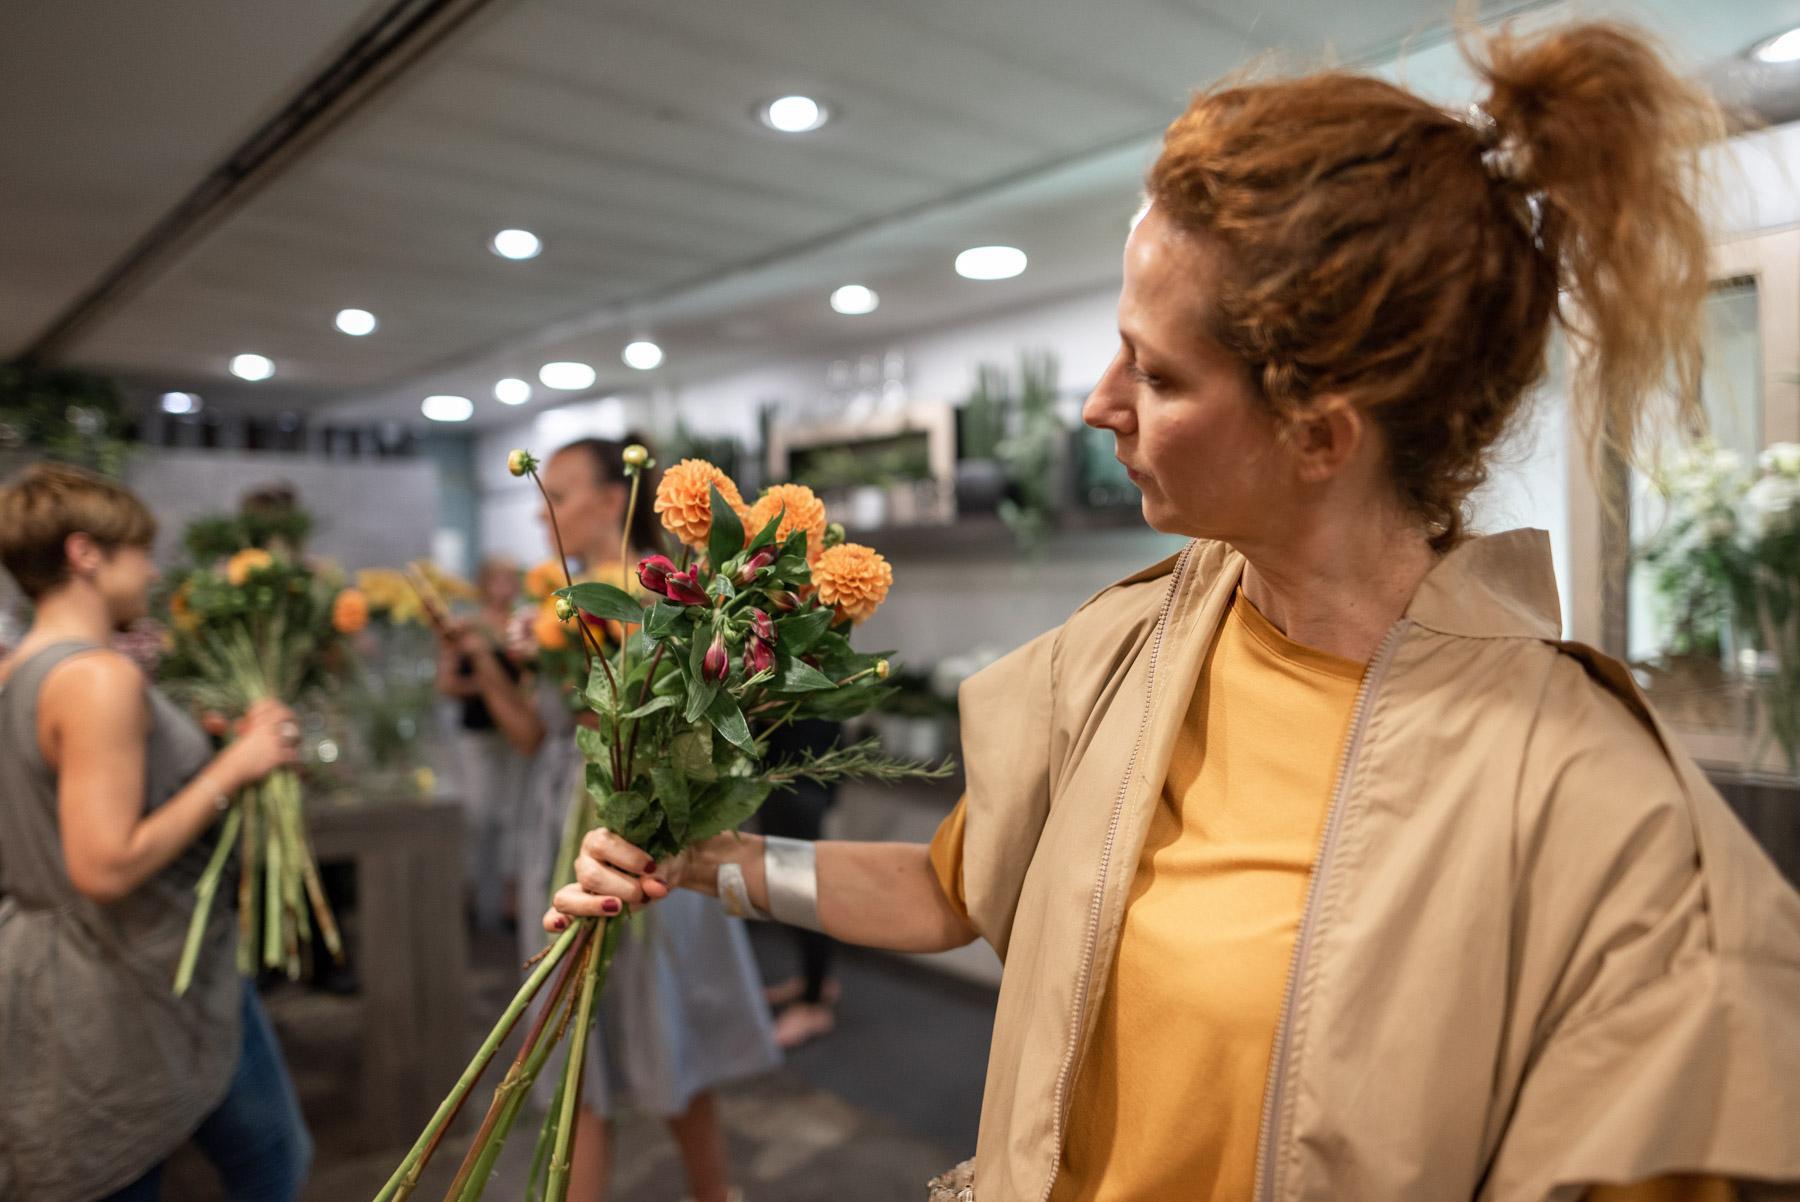 cvetlicno druzenje gardenia roze nika veger beautyfull blog zoofa hummel trg republike